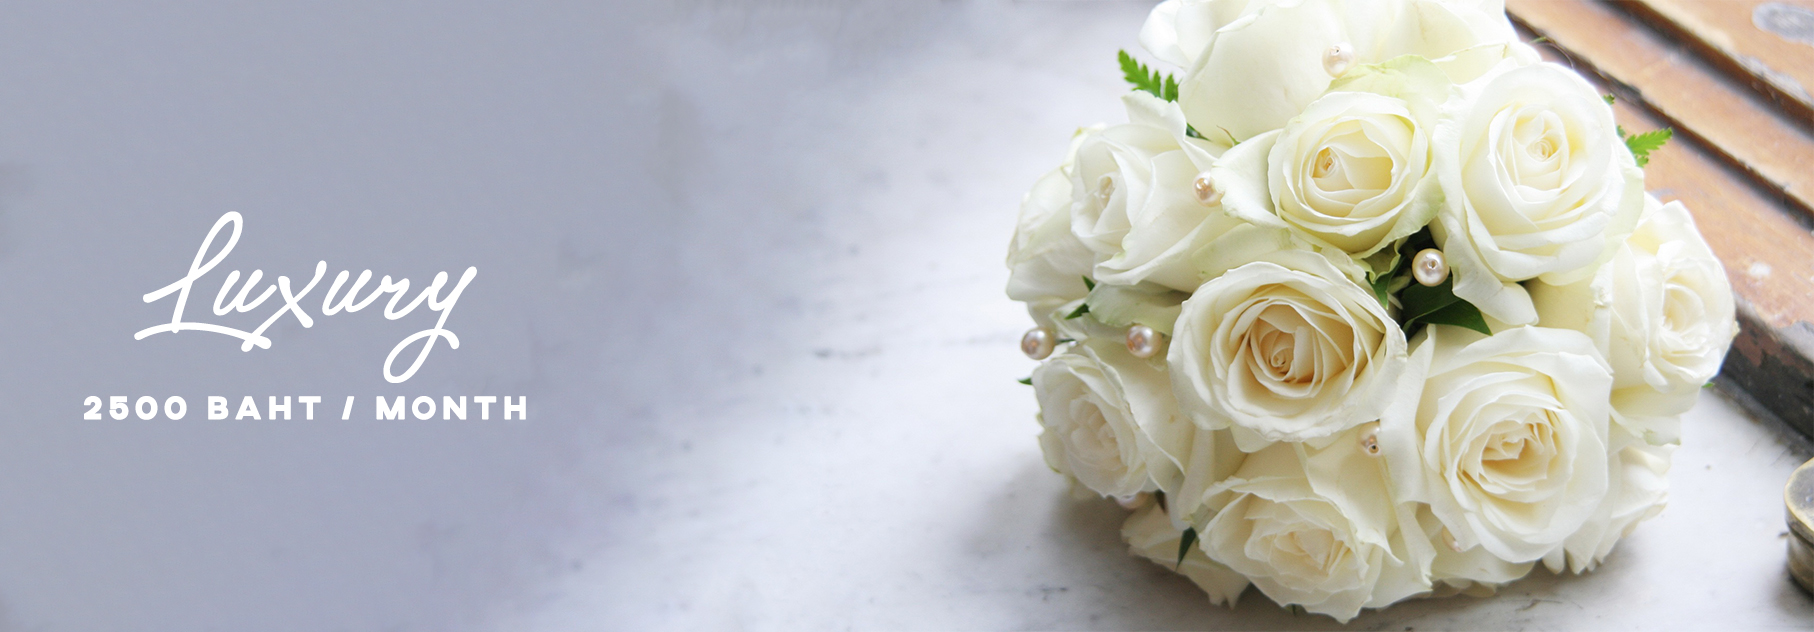 Luxury Flower subscription